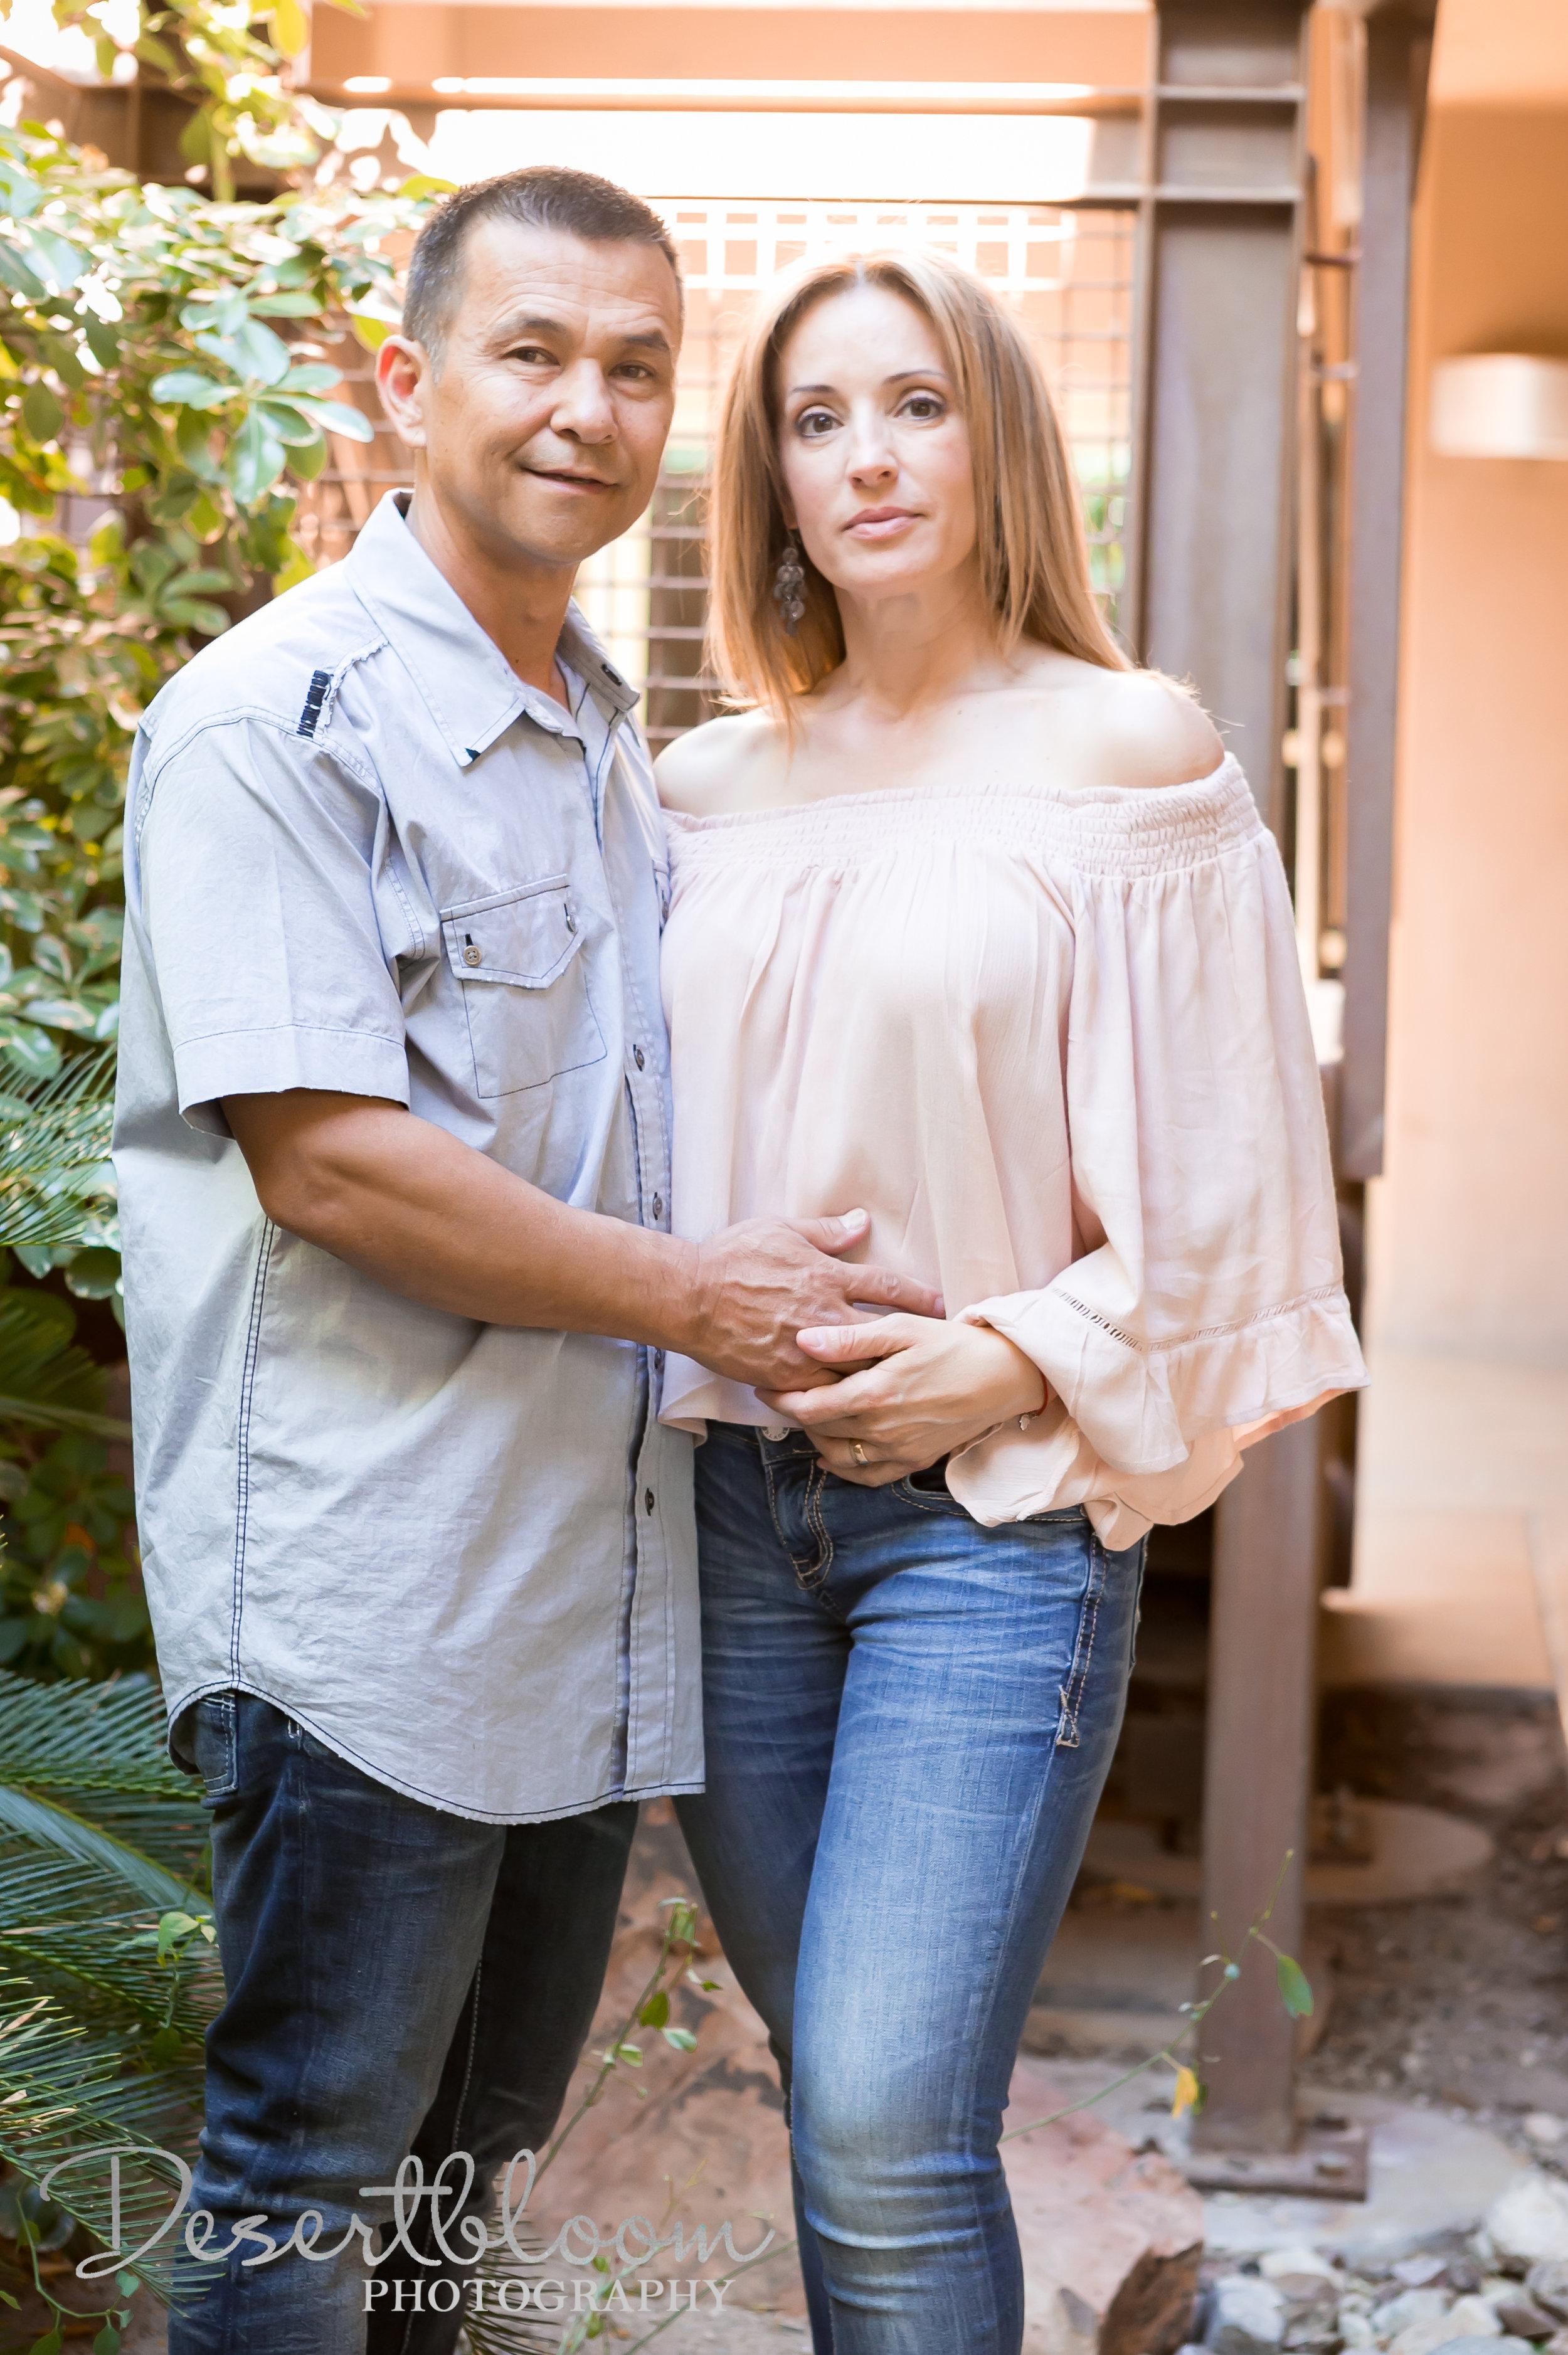 las-vegas-couples-photographer-desert-romantic-elopement.jpg